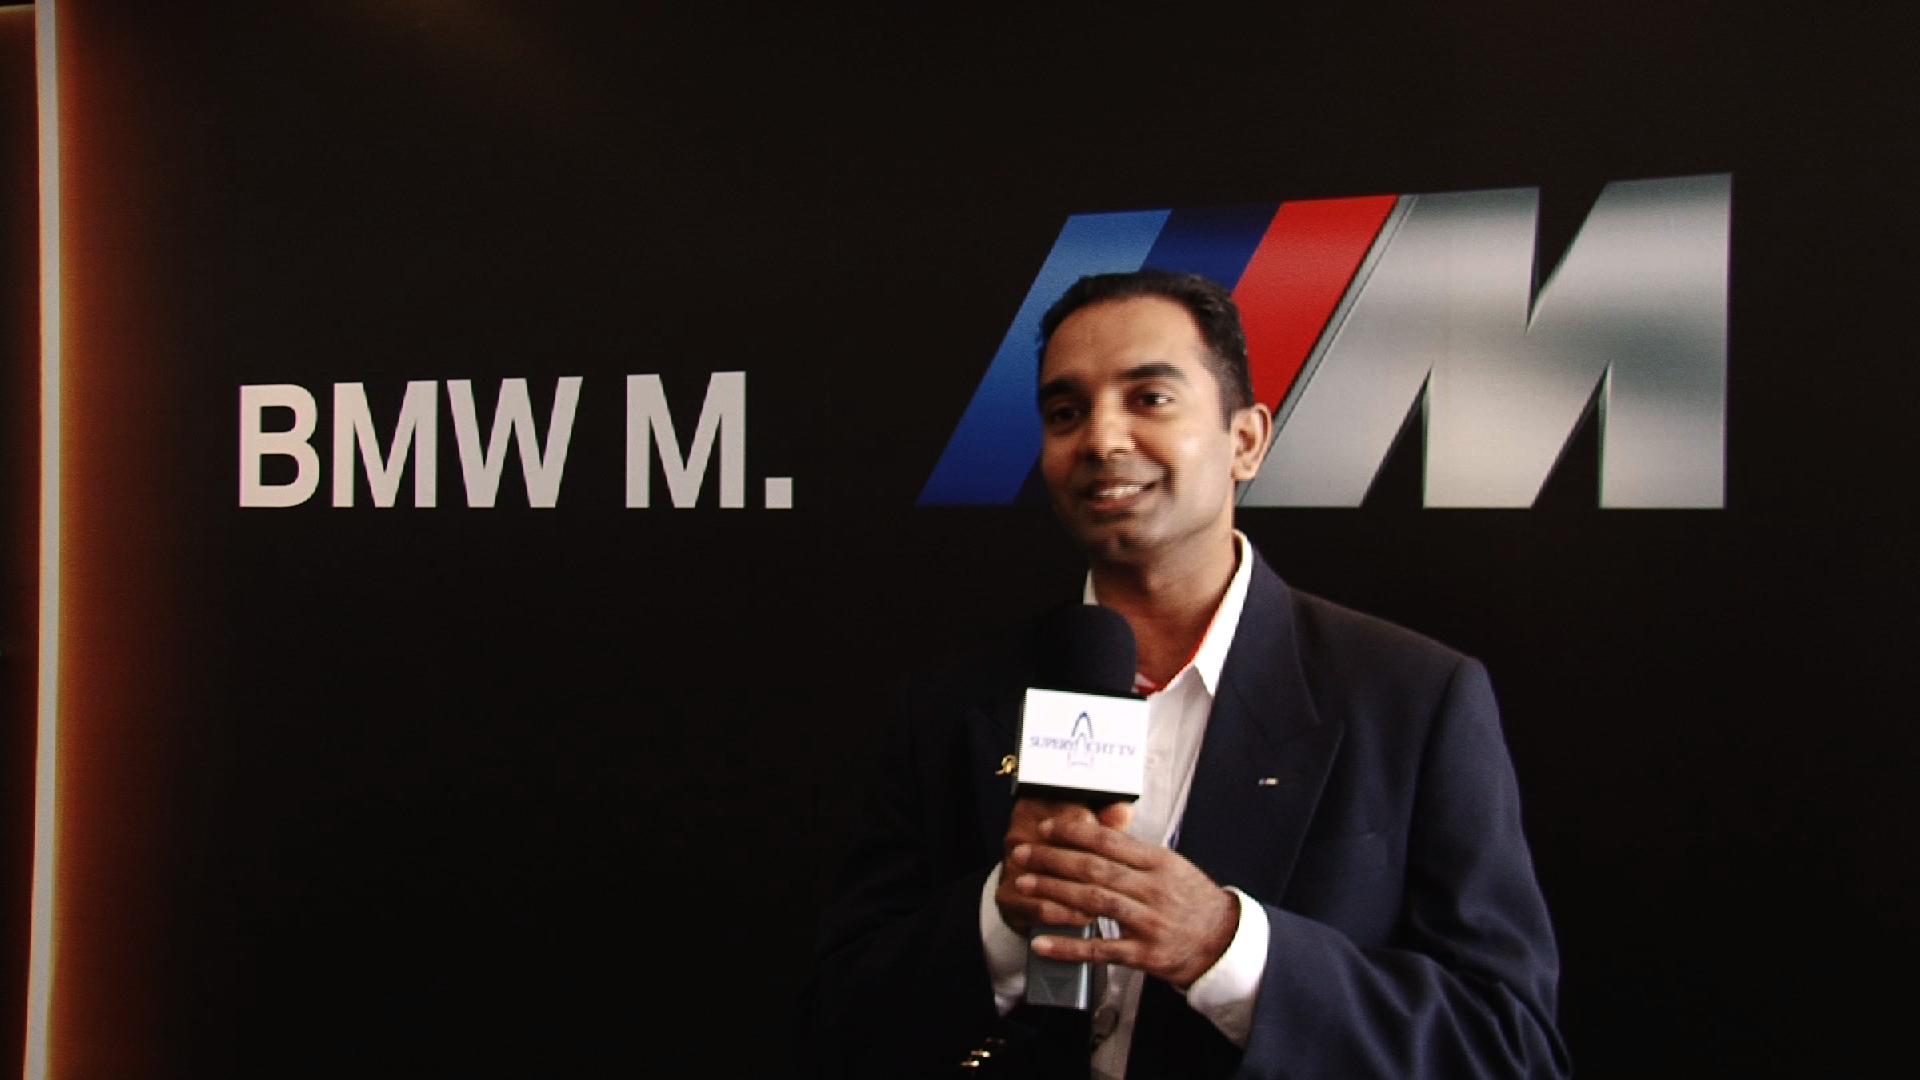 2012 Singapore Yacht Show – BMW M (Kugan)